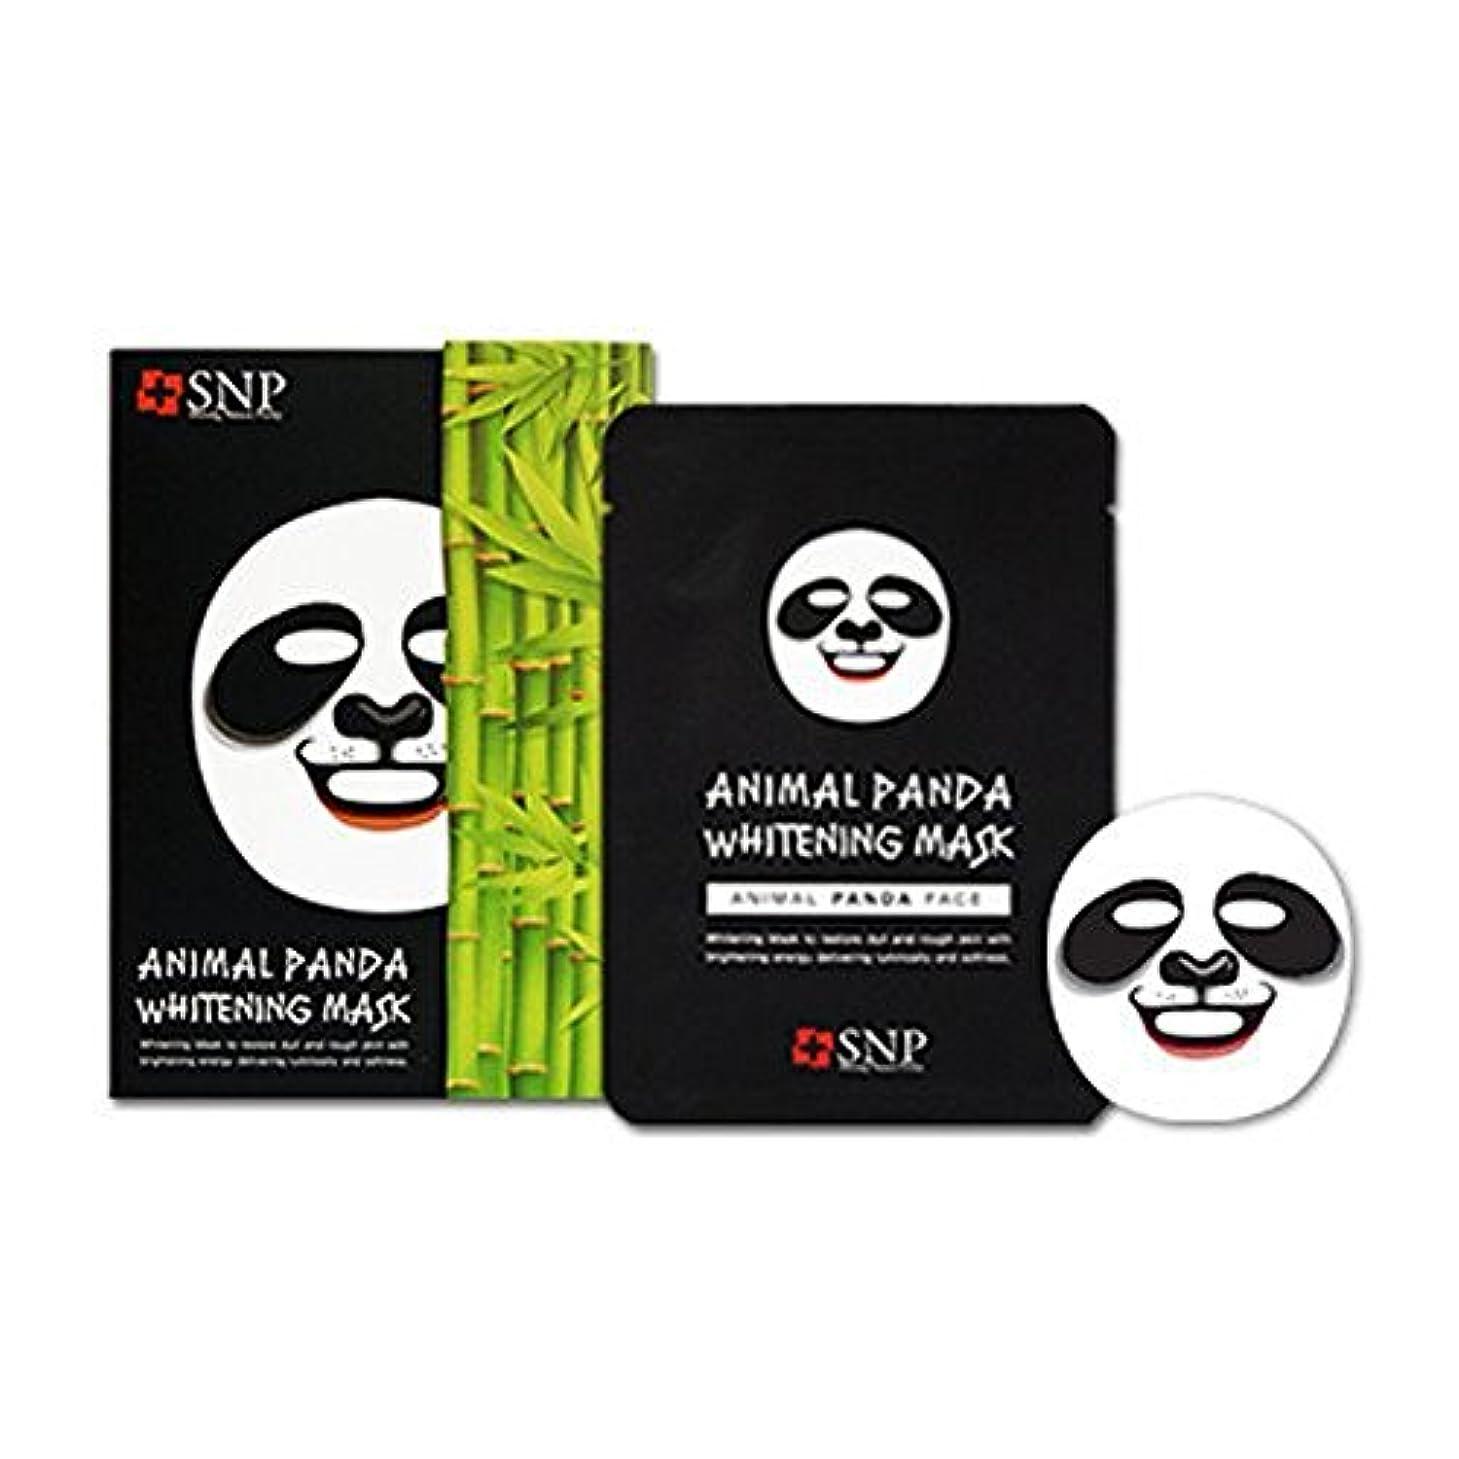 SNP エスエンピ 動物マスクシート 10枚入り1box (Animal Mask 10 sheet) 海外直送品 (パンダ Panda)